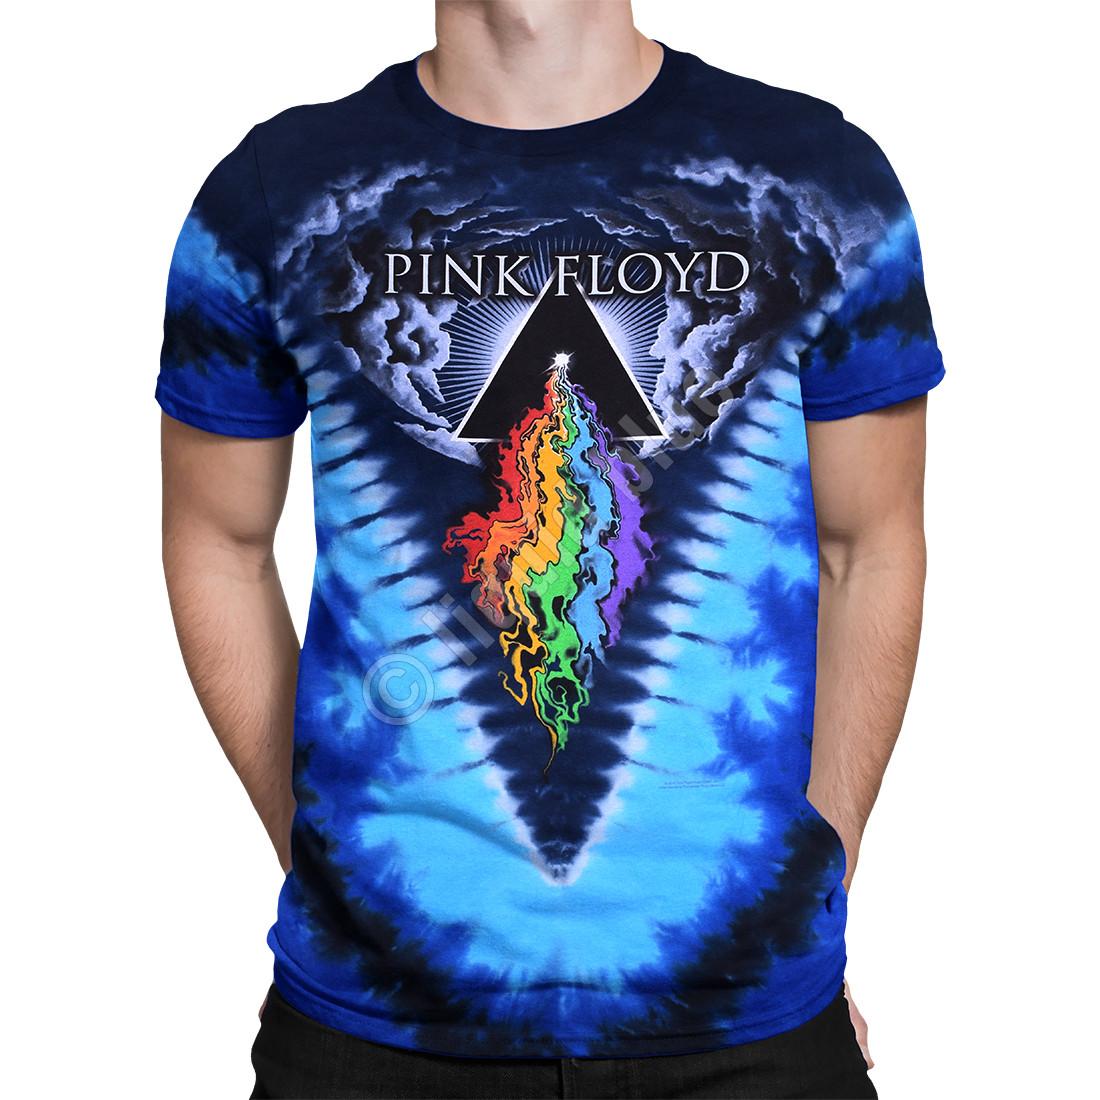 Pink Floyd Prism River Tie-Dye T-Shirt Tee Liquid Blue a68b63908